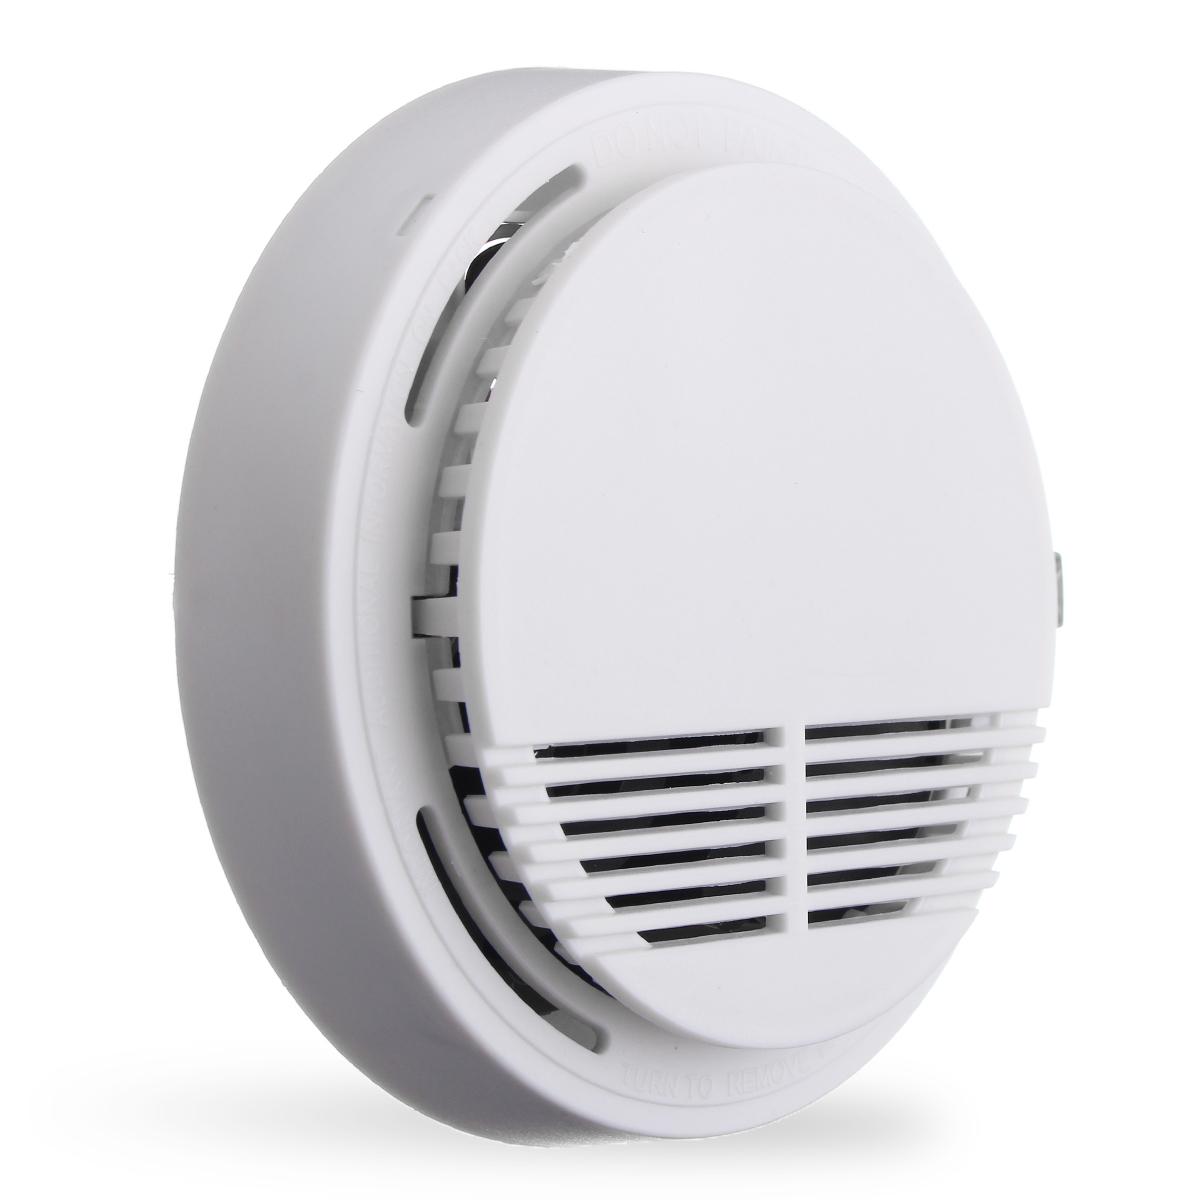 Home security system draadloos rookmelder brandalarm flevo shop - Rookdetector ontwerp ...